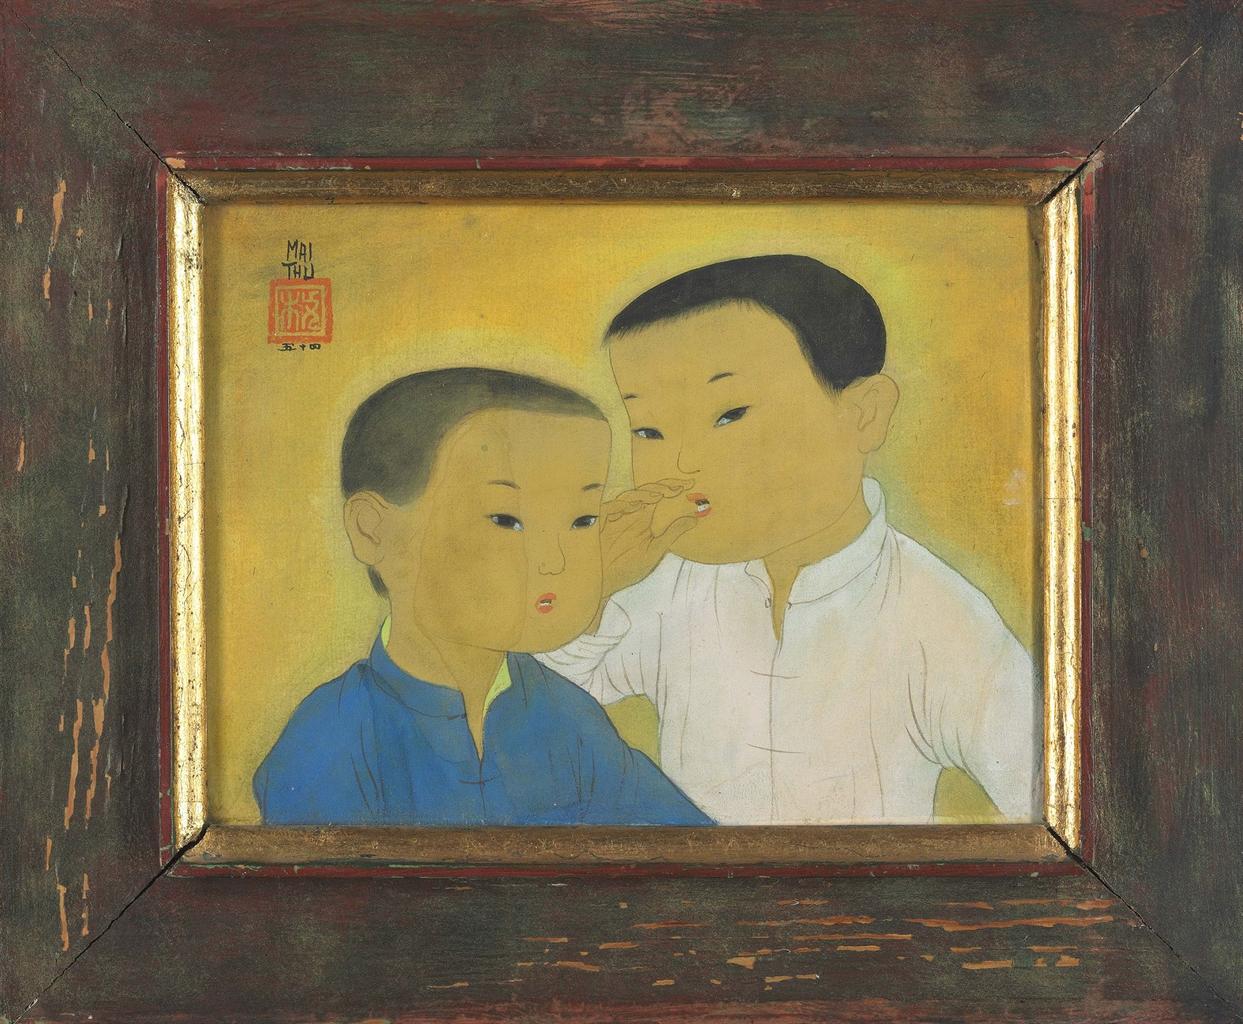 Mai Trung Thu-Confidence-1954